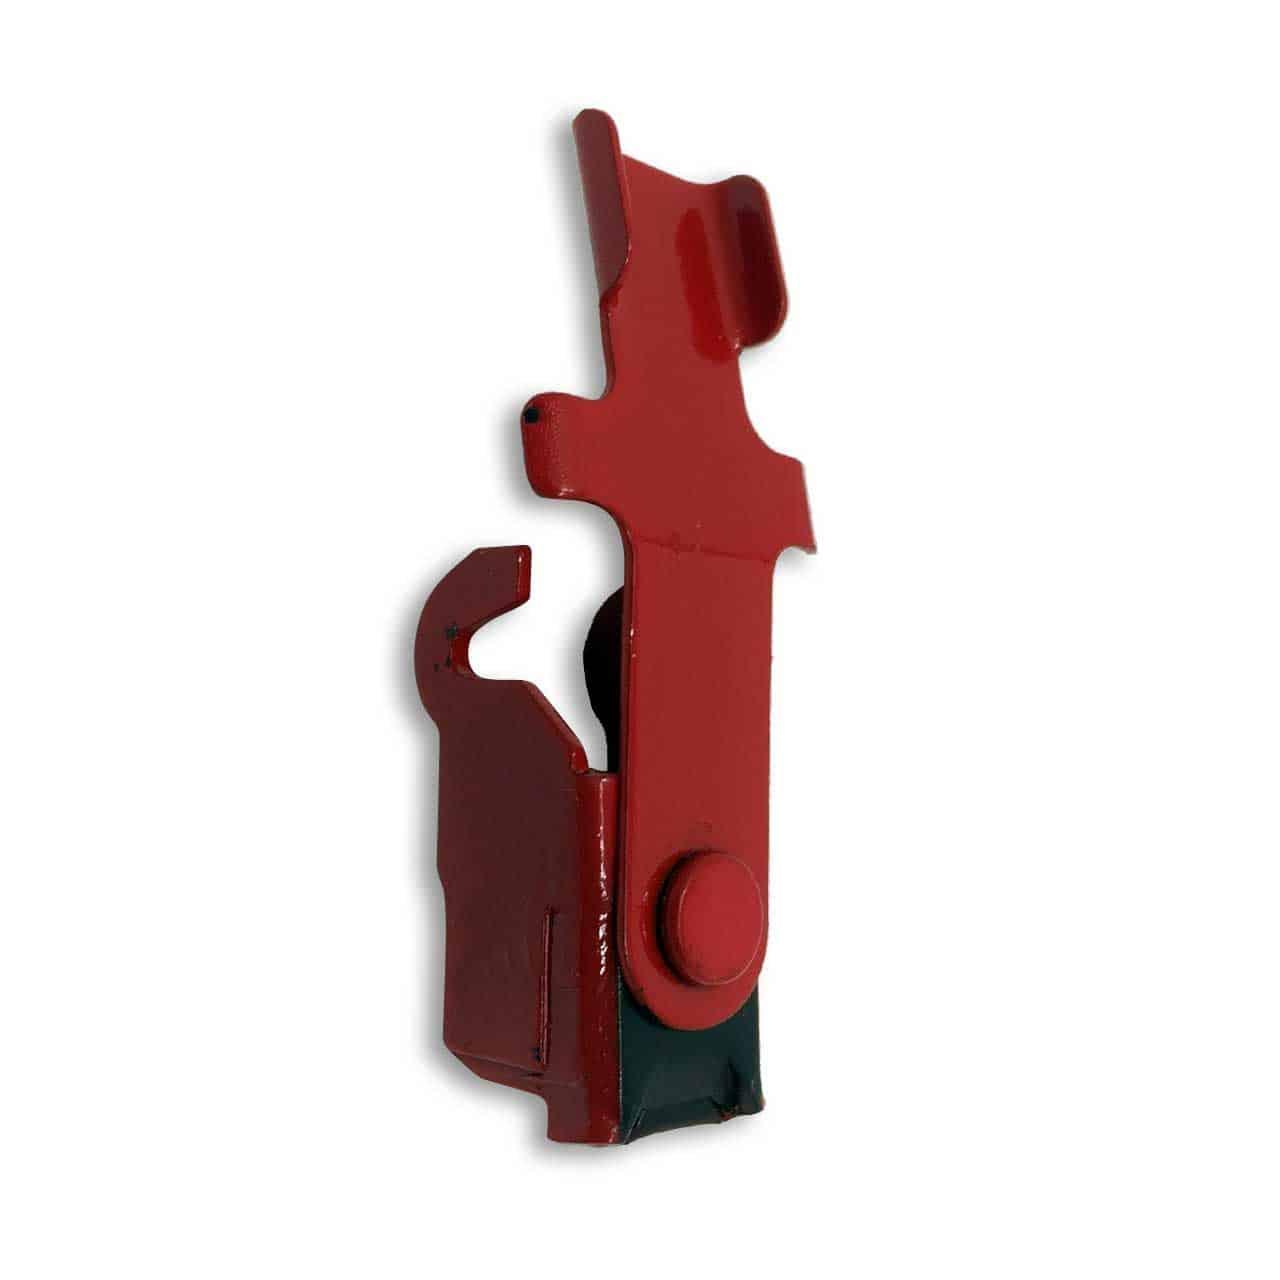 Buckaroos Outward Clinch Tacker - Replacement Door